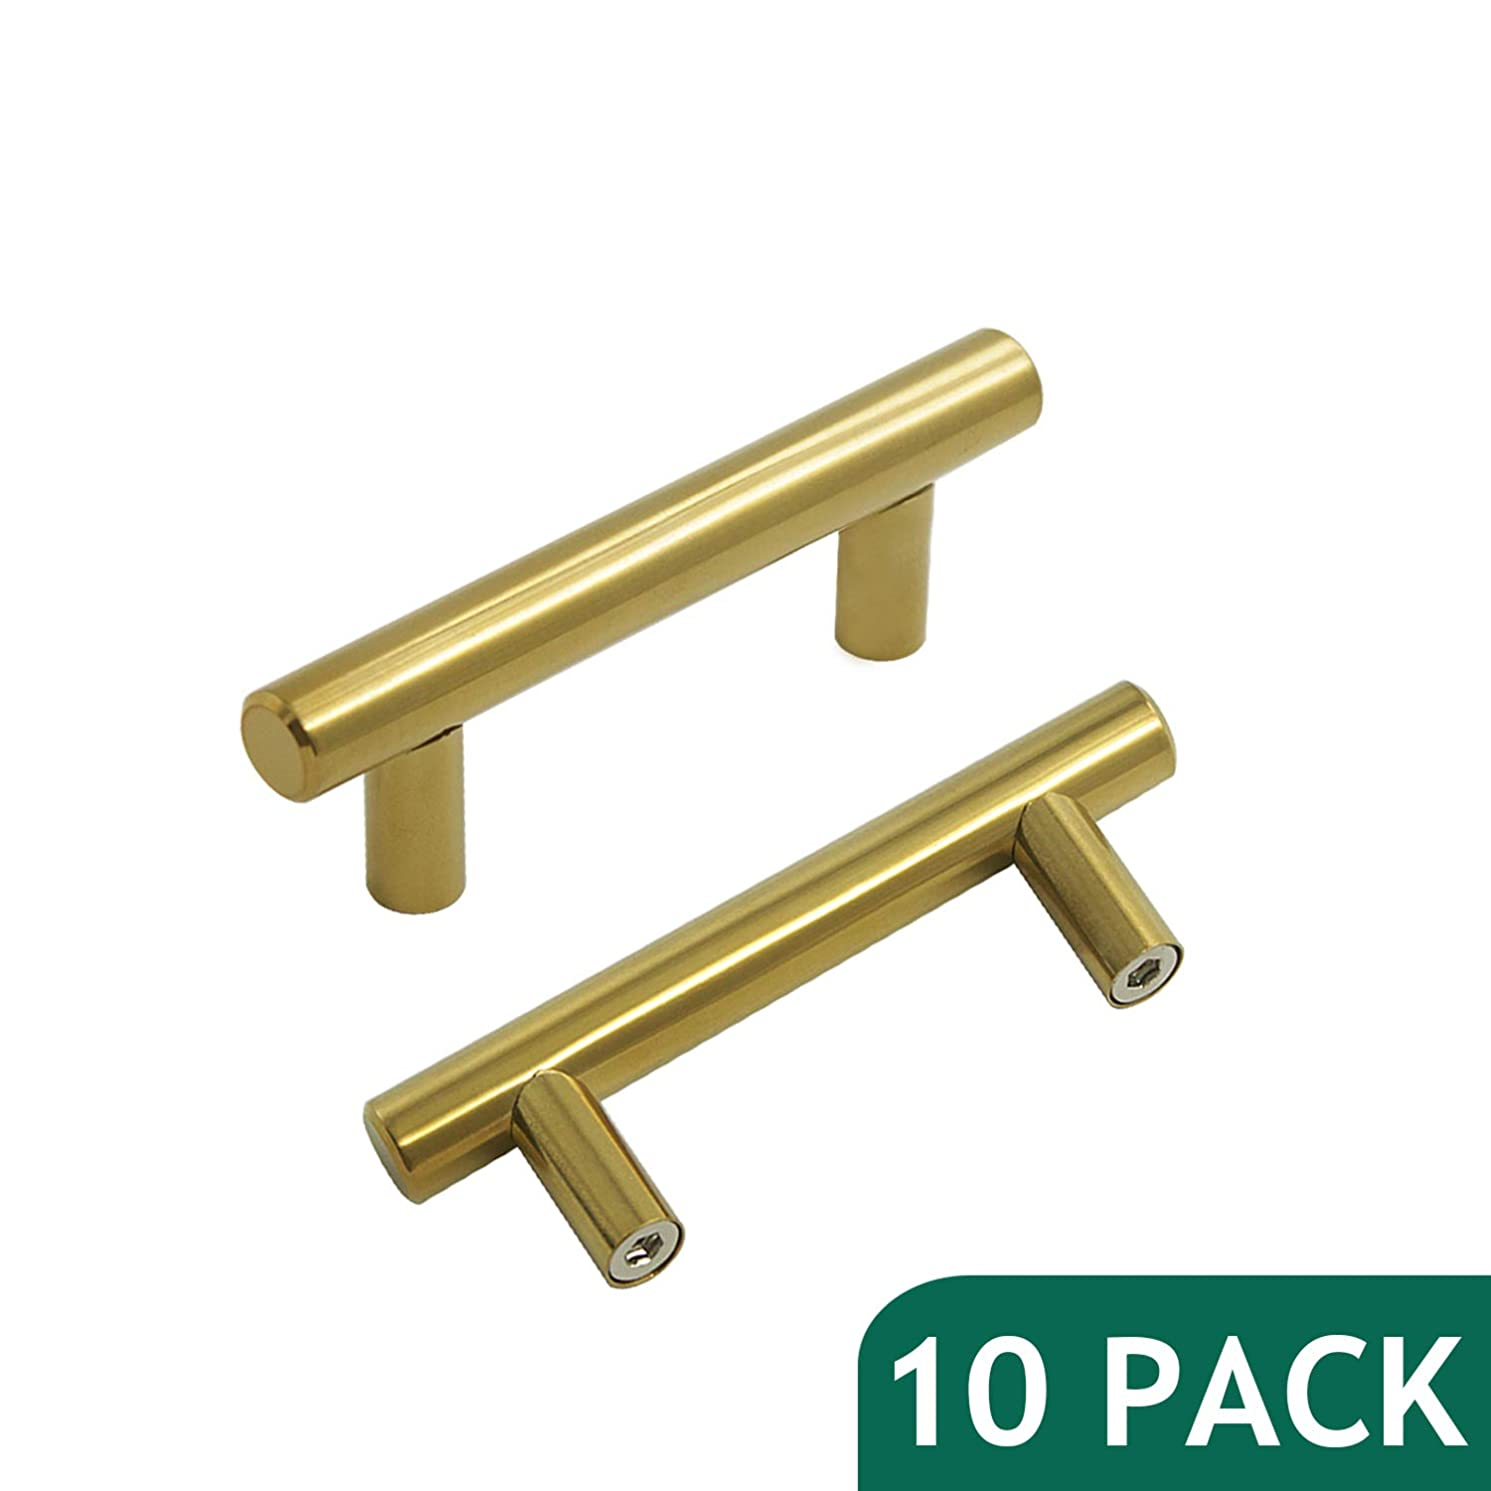 Probrico Brushed Brass Modern Cabinet Hardware Kitchen Cabinet T Bar Knobs Dresser Pull Bathroom Gold Drawer Handles - 2-1/2